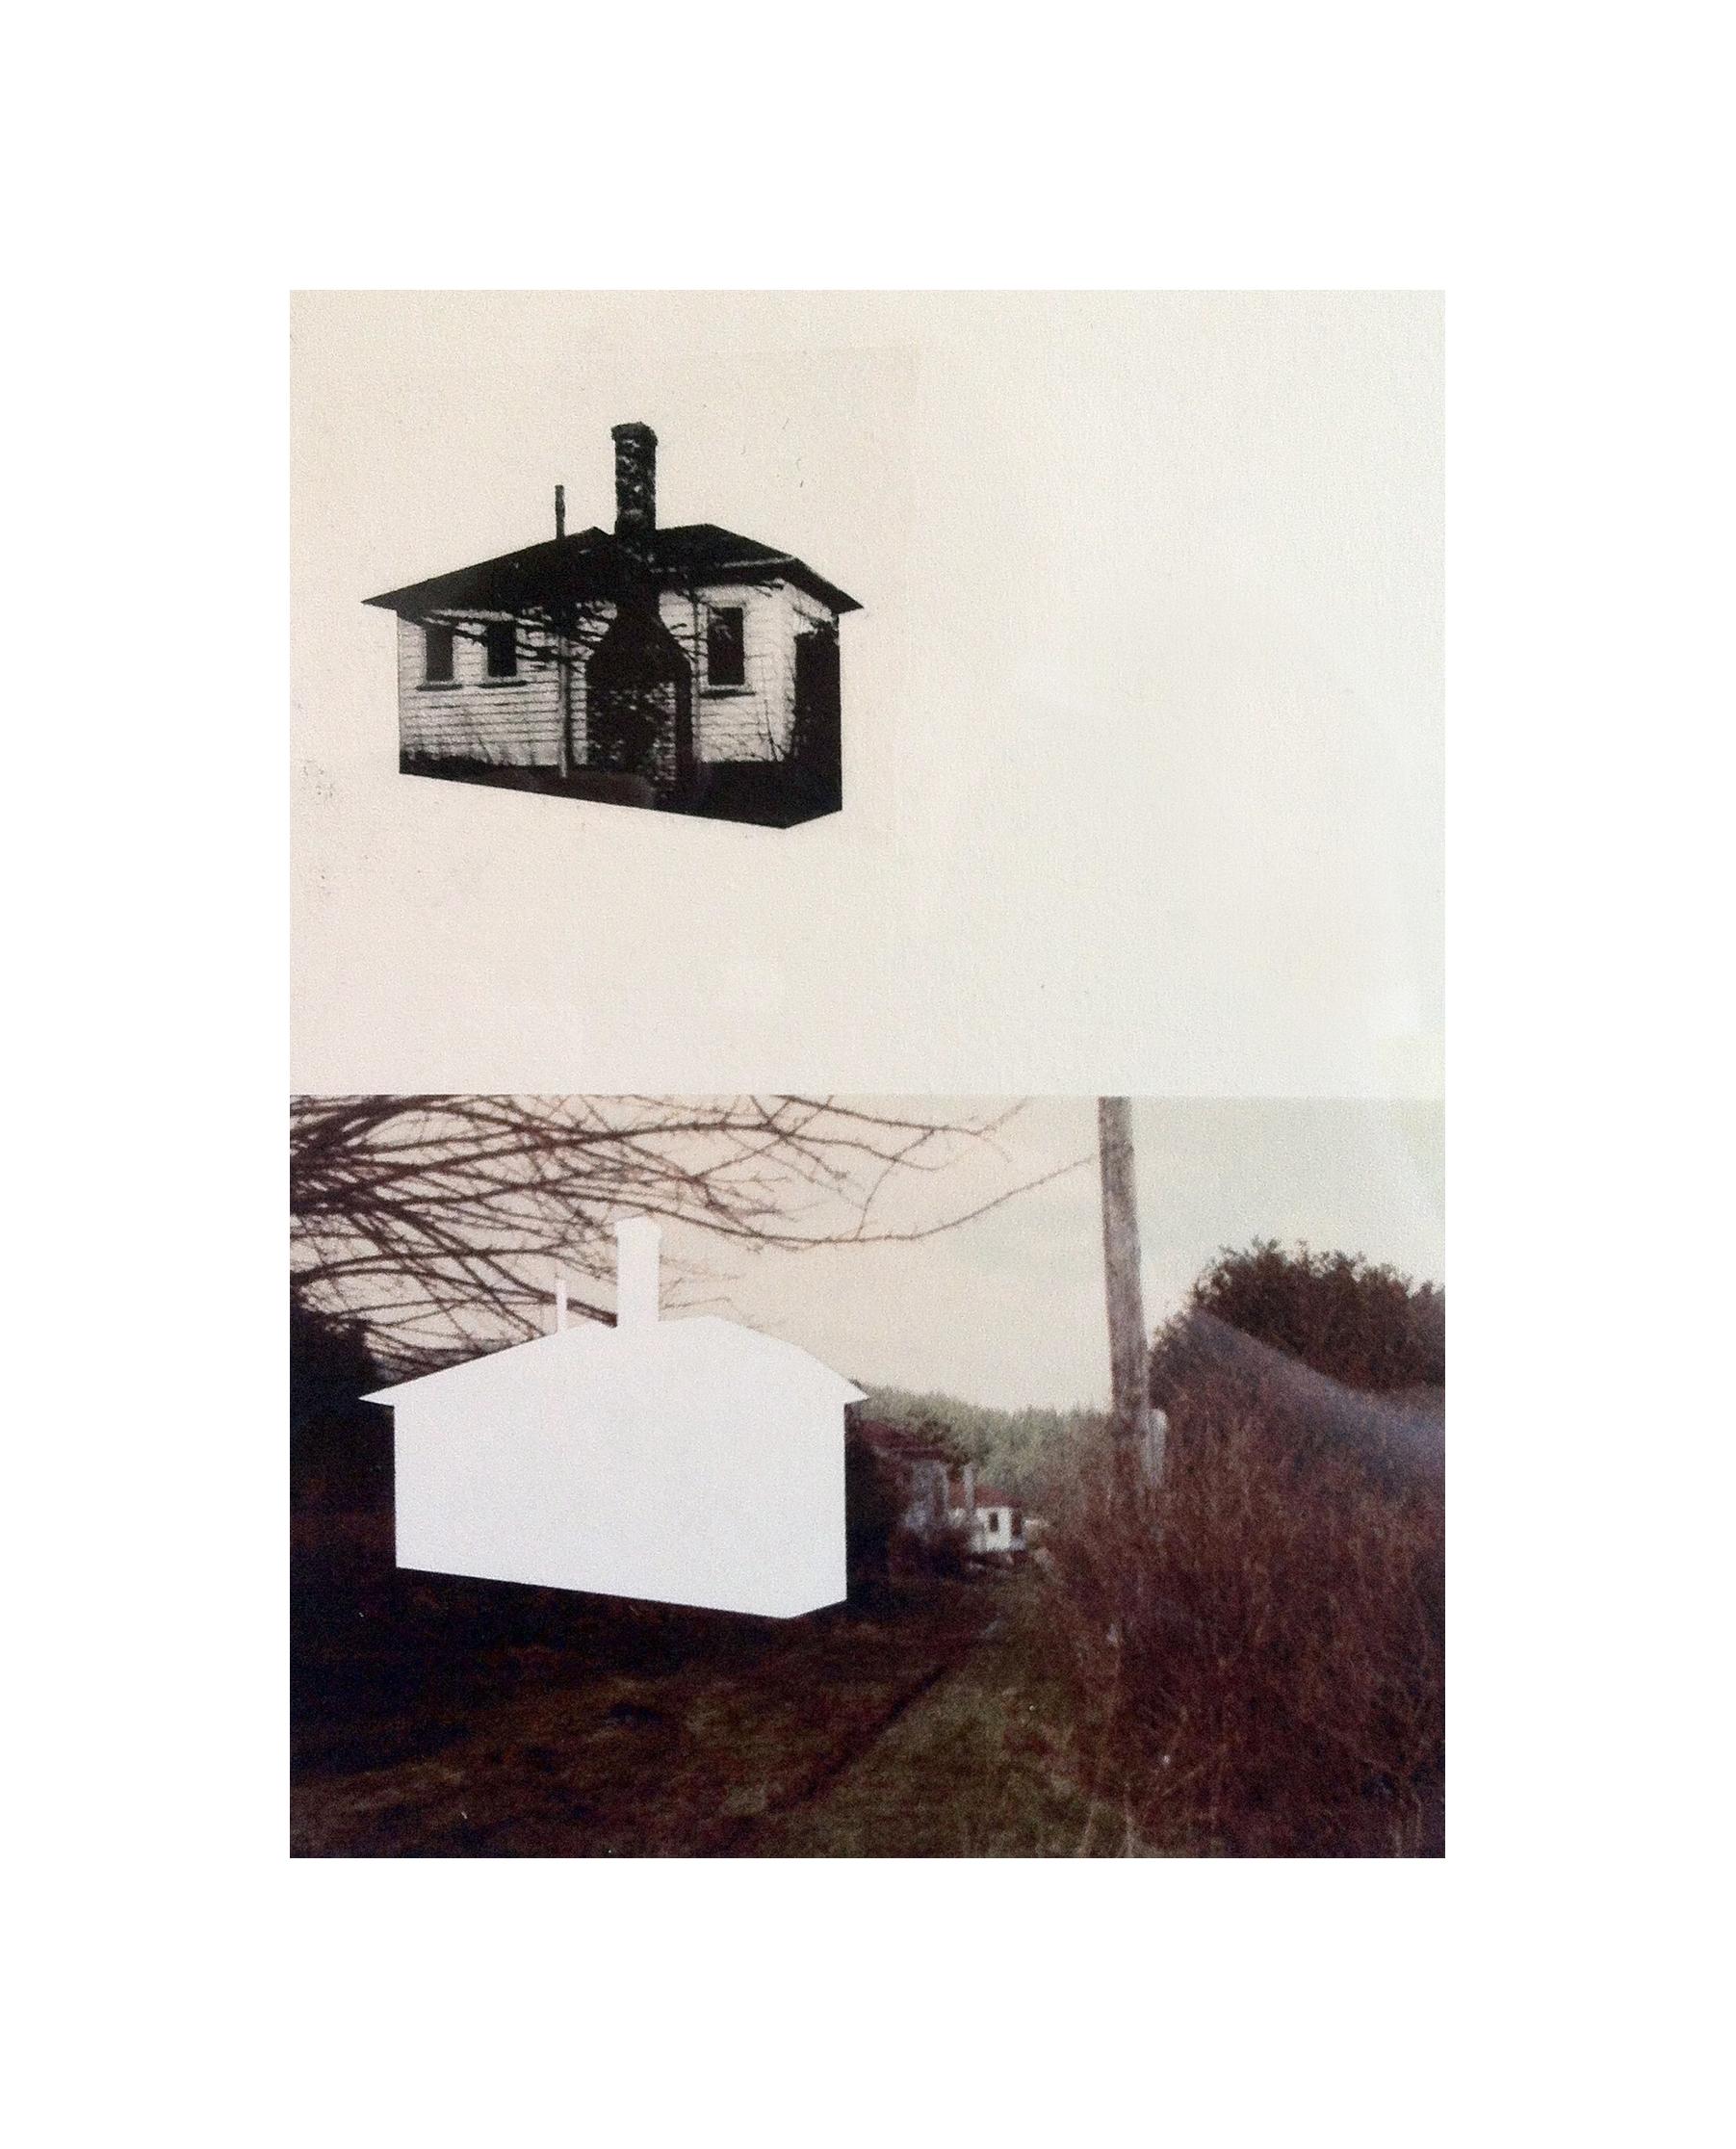 "Cabin Cutouts: Union Steamship Cottages     Intaglio, digital, chine coll  é      15""x11"" 2013"